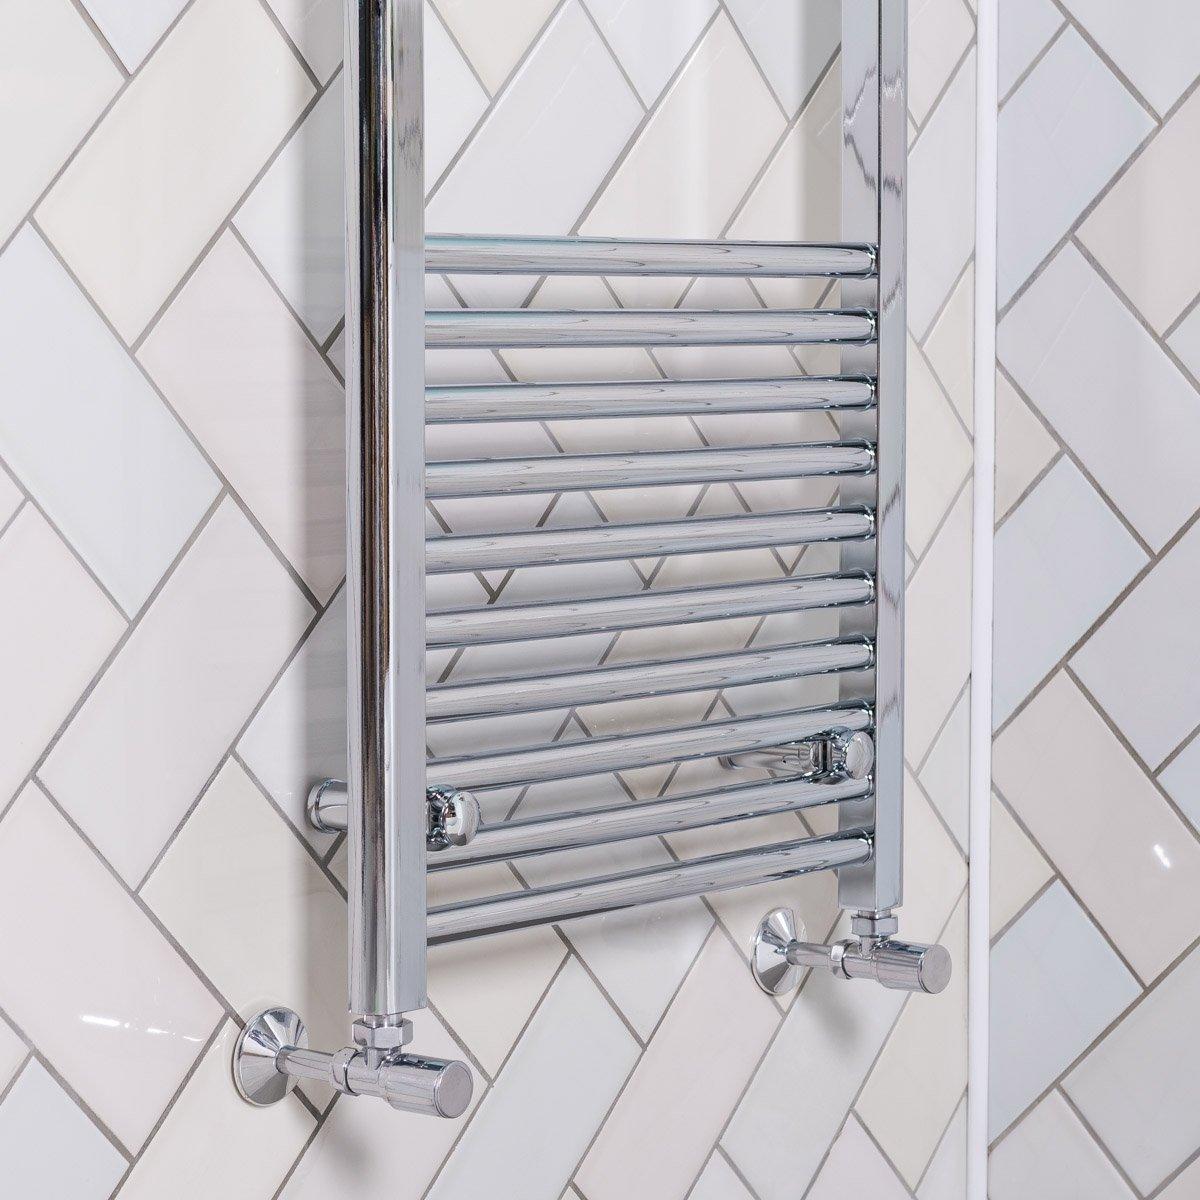 Tradesman Straight Chrome Heated Towel Rail Warmer: Bathroom Heated Towel Rail Radiator Chrome Straight Ladder